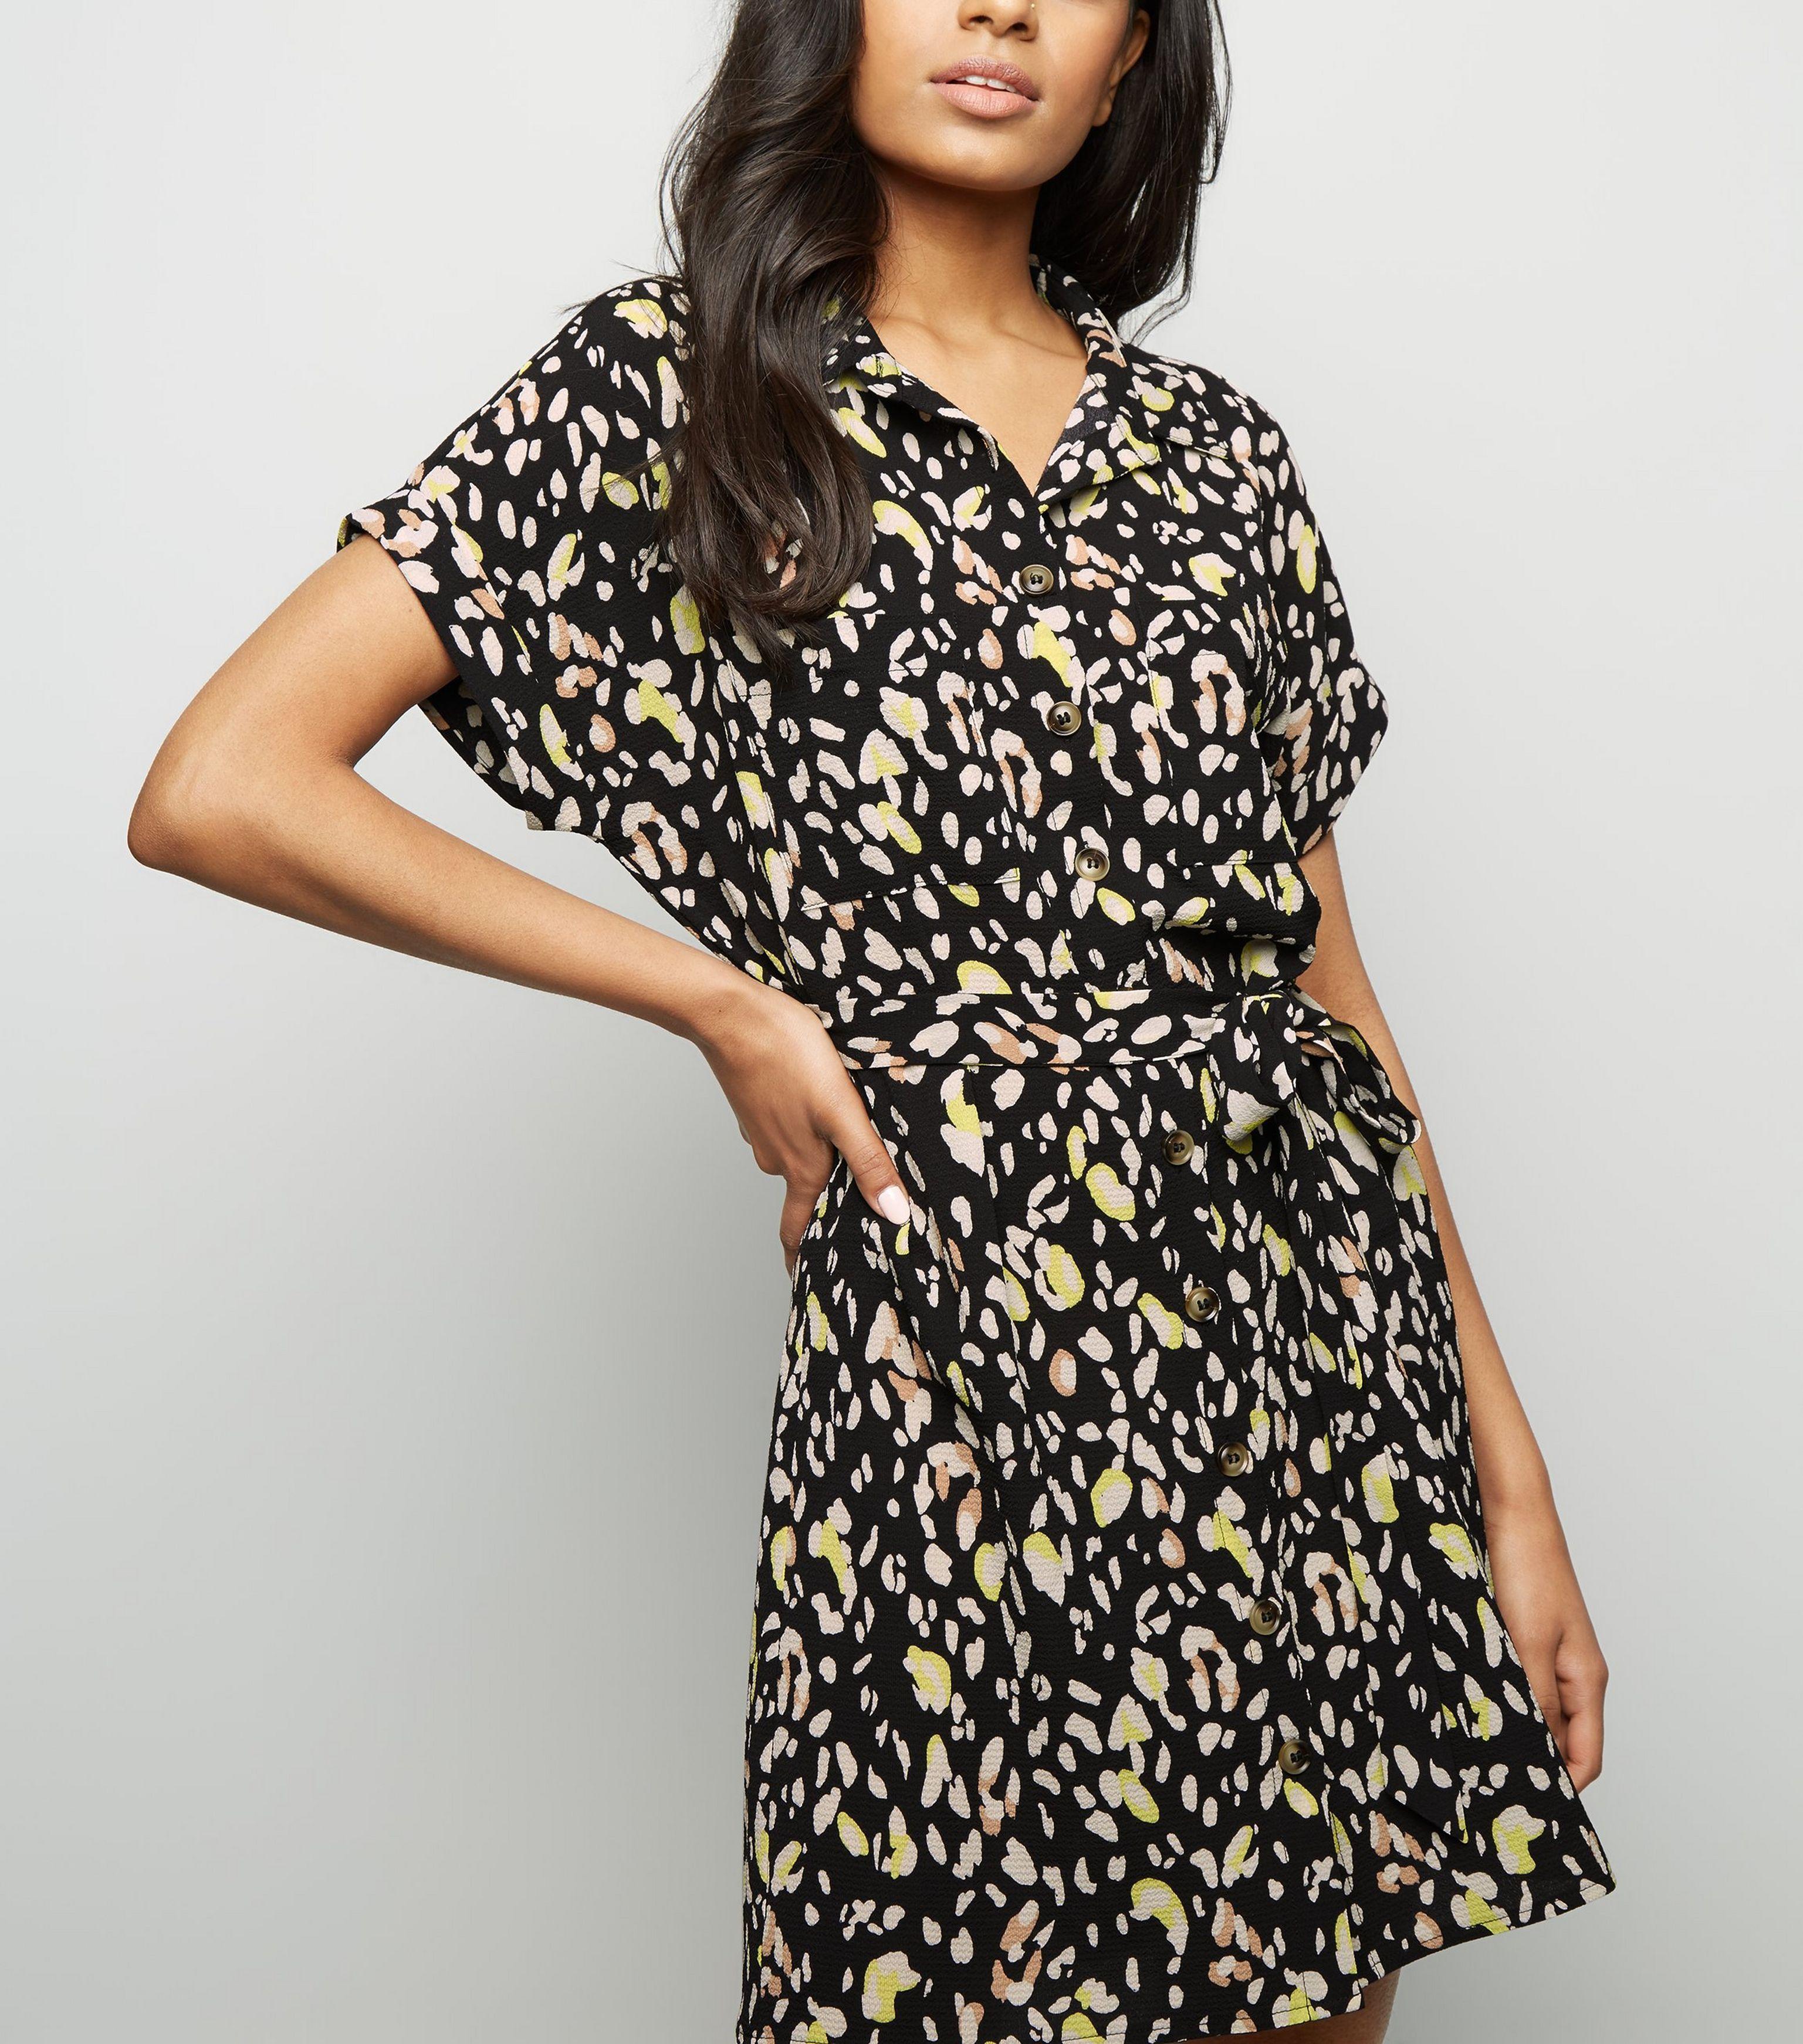 0cbdffbf91 New Look Petite Black Animal Print Shirt Dress in Black - Lyst